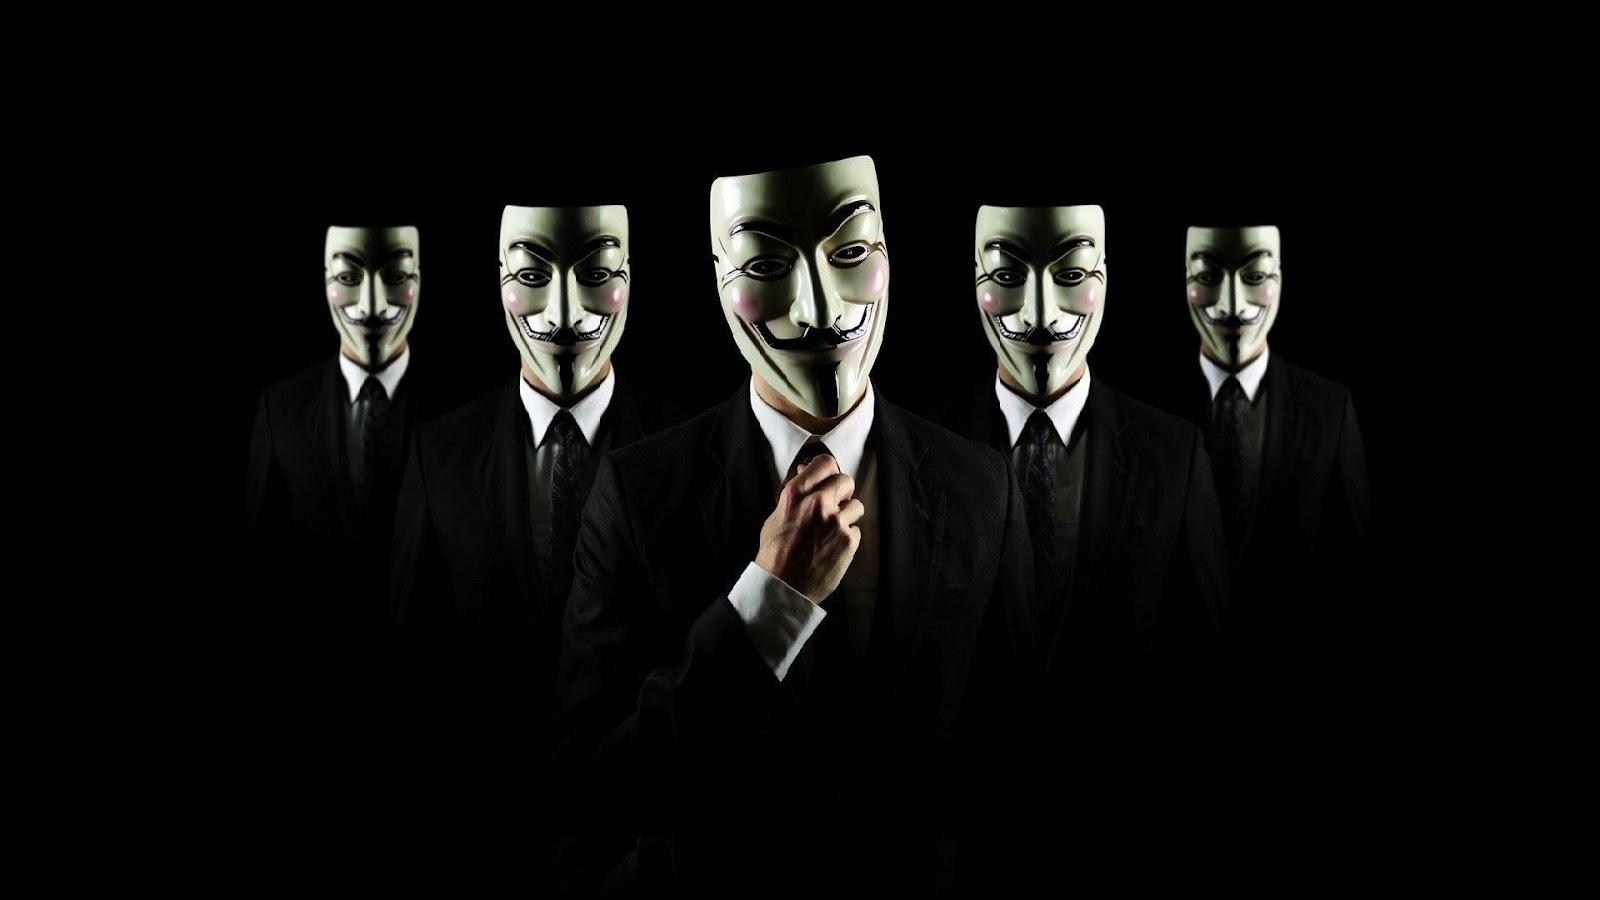 http://1.bp.blogspot.com/-_yZJ5L0JEjU/UE6ePQsCM_I/AAAAAAAAABg/ZtsNC_RVn34/s1600/anonymous-masked-1080p-hd-wallpaper.jpg